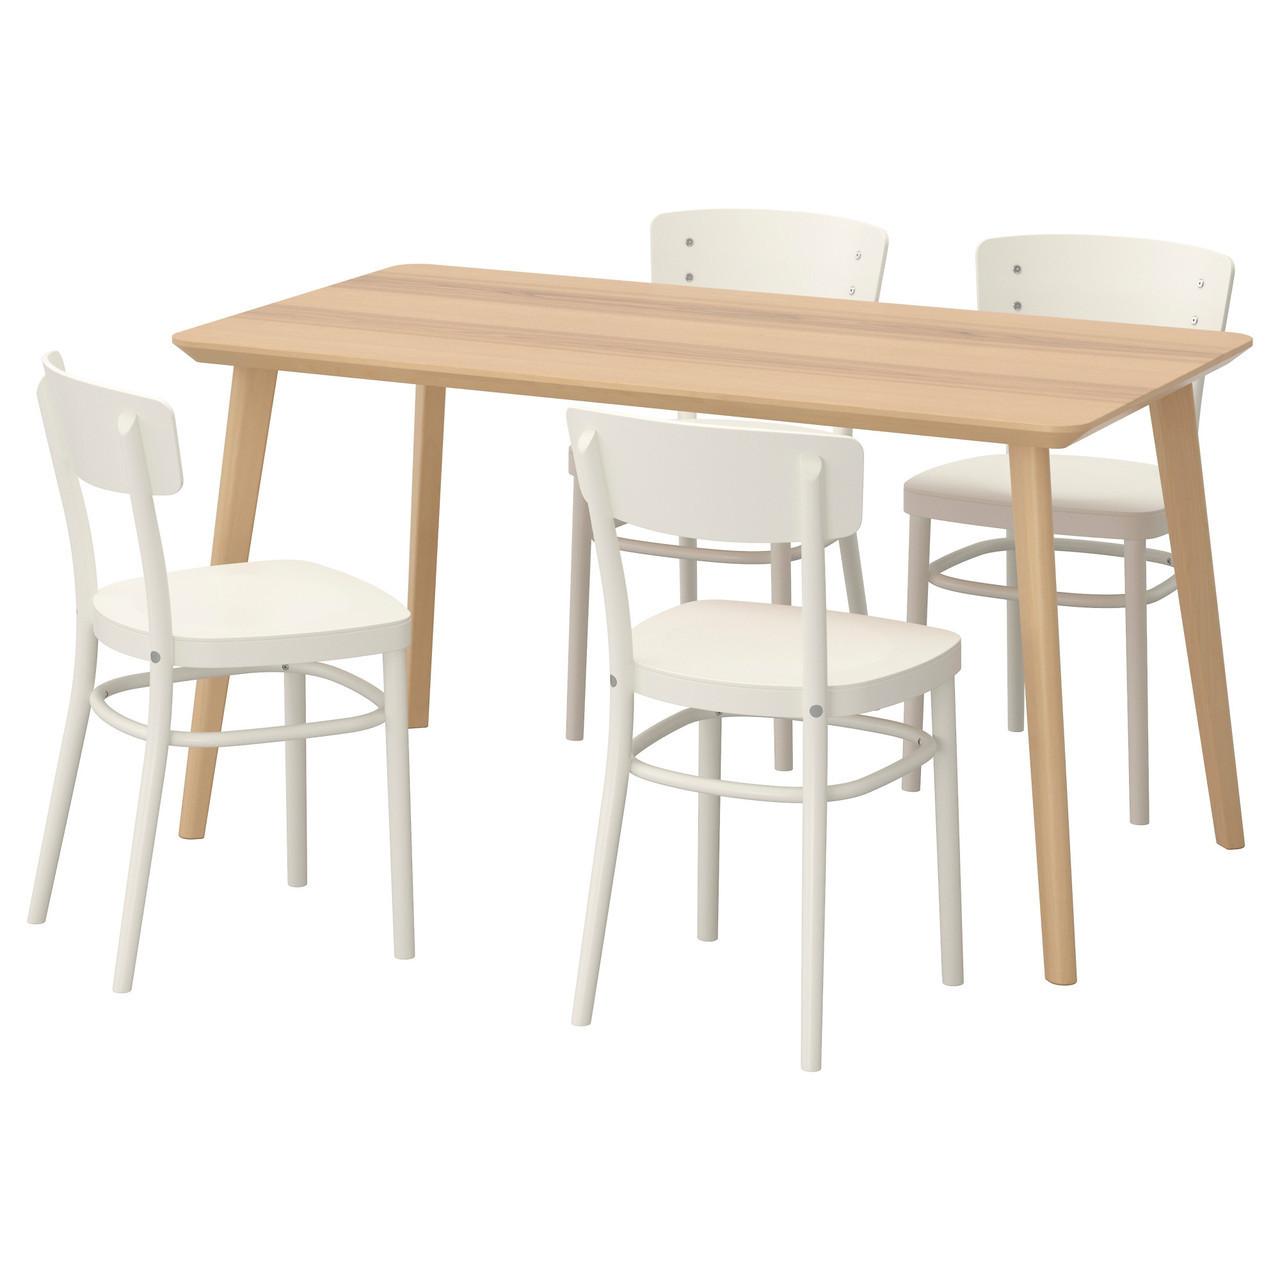 LISABO / IDOLF Стол и 4 стула, ясеневый шпон, белый 491.614.83